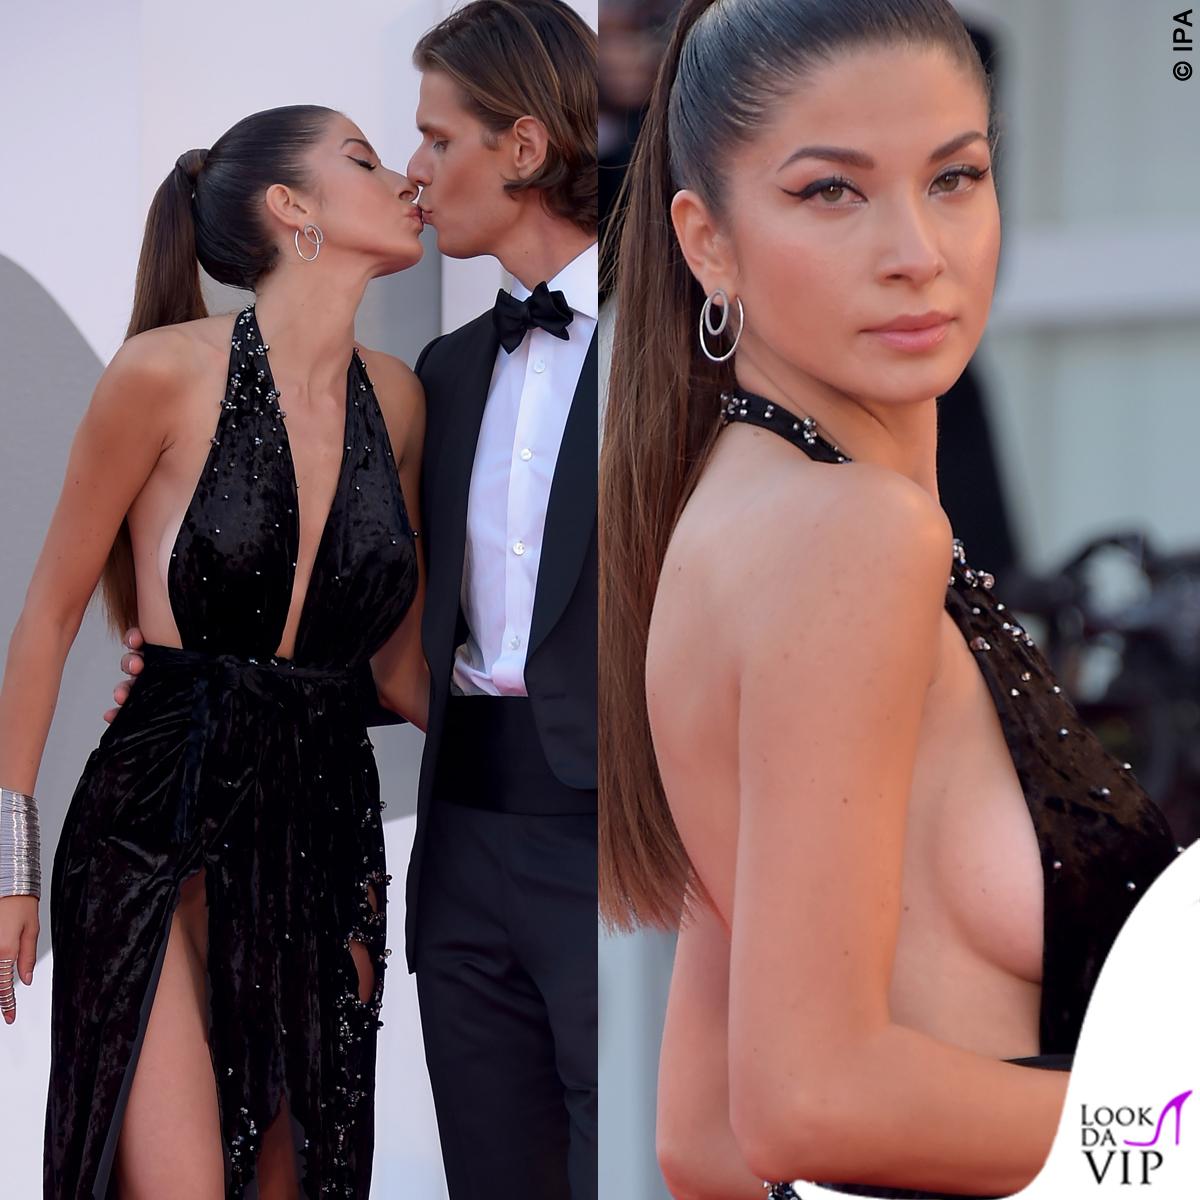 Matilde Gioli a Venezia 77: scollatura hot/ Nude look a